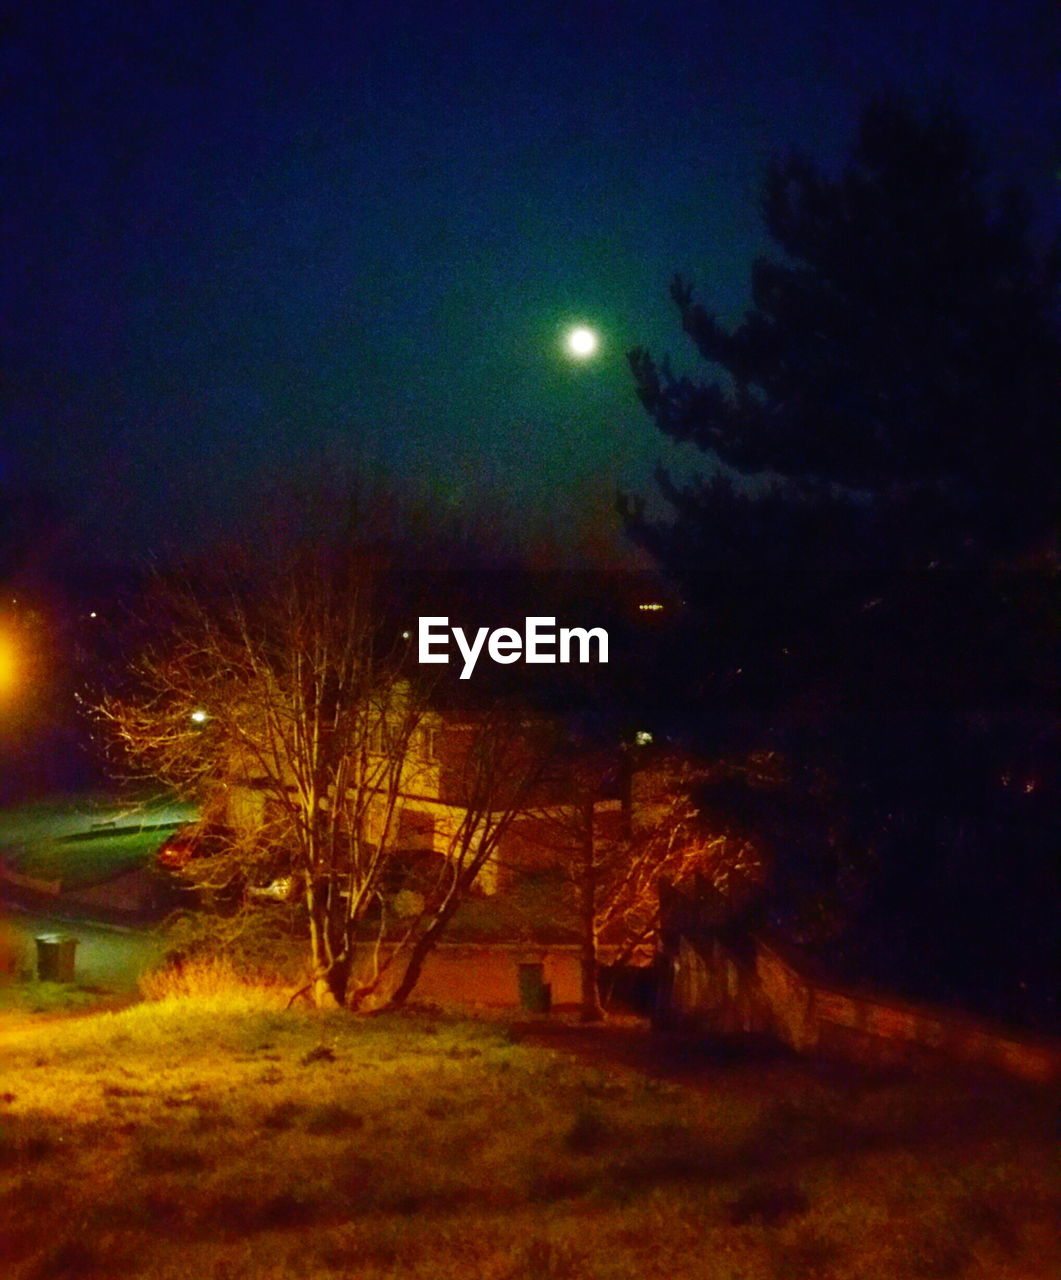 night, moon, nature, tree, sky, no people, illuminated, tranquility, beauty in nature, outdoors, tranquil scene, astronomy, grass, moonlight, scenics, bare tree, half moon, building exterior